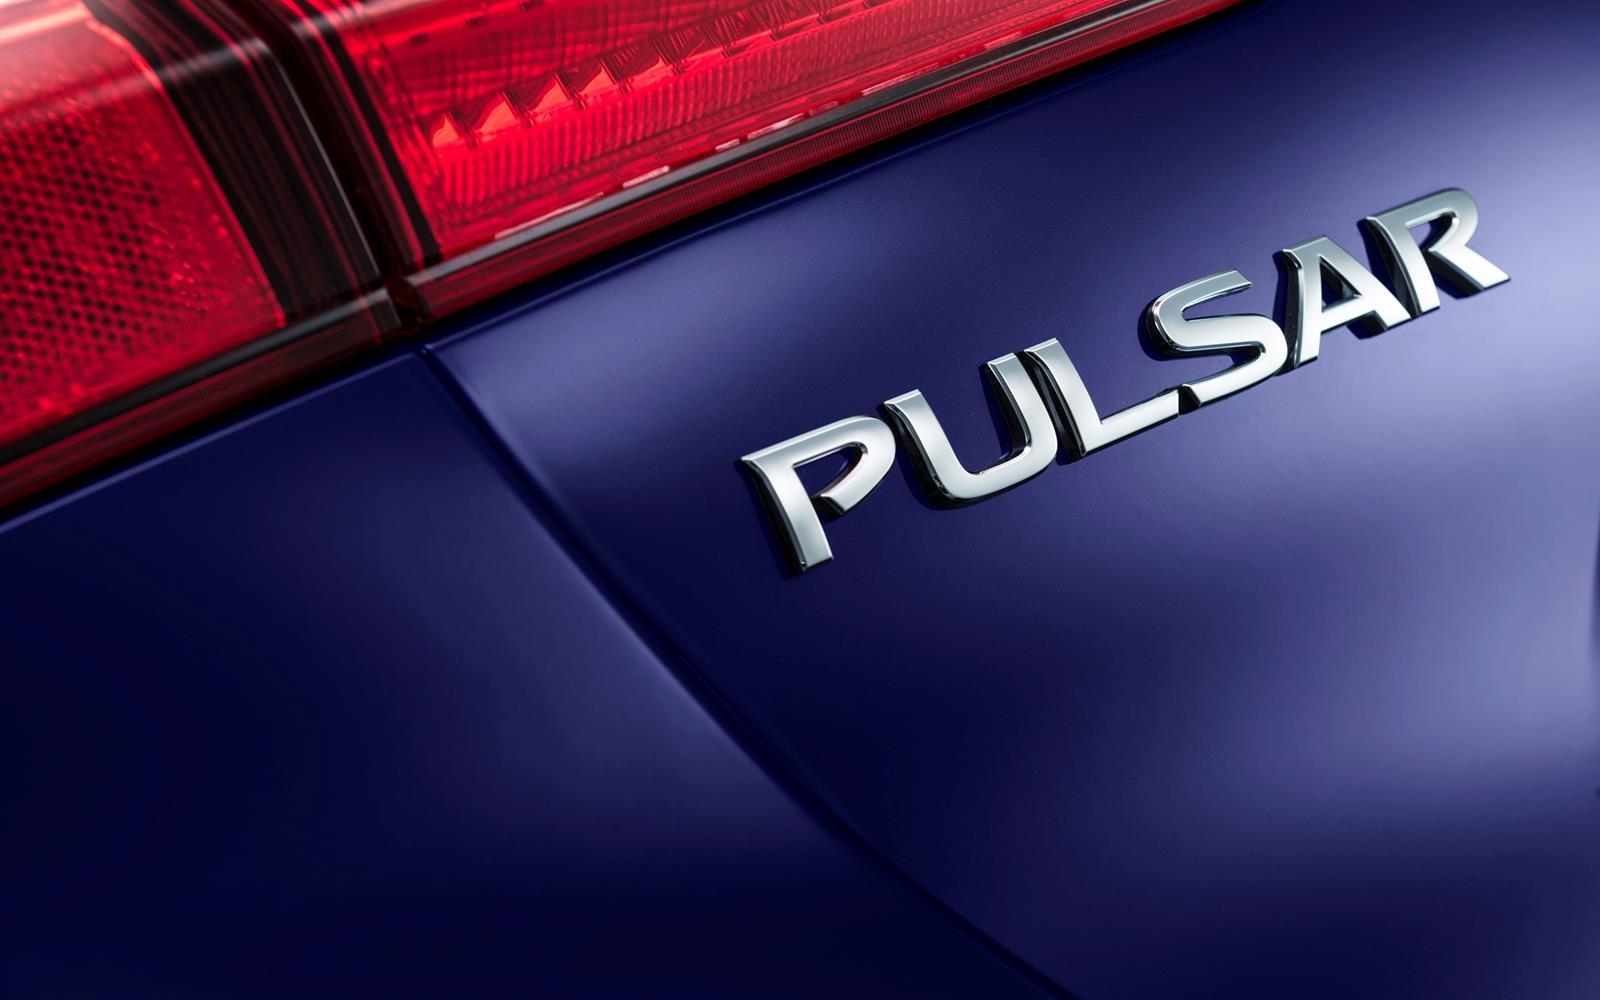 Nissan Pulsar 2014 Badging Detail FrontSeatDriver.co.uk